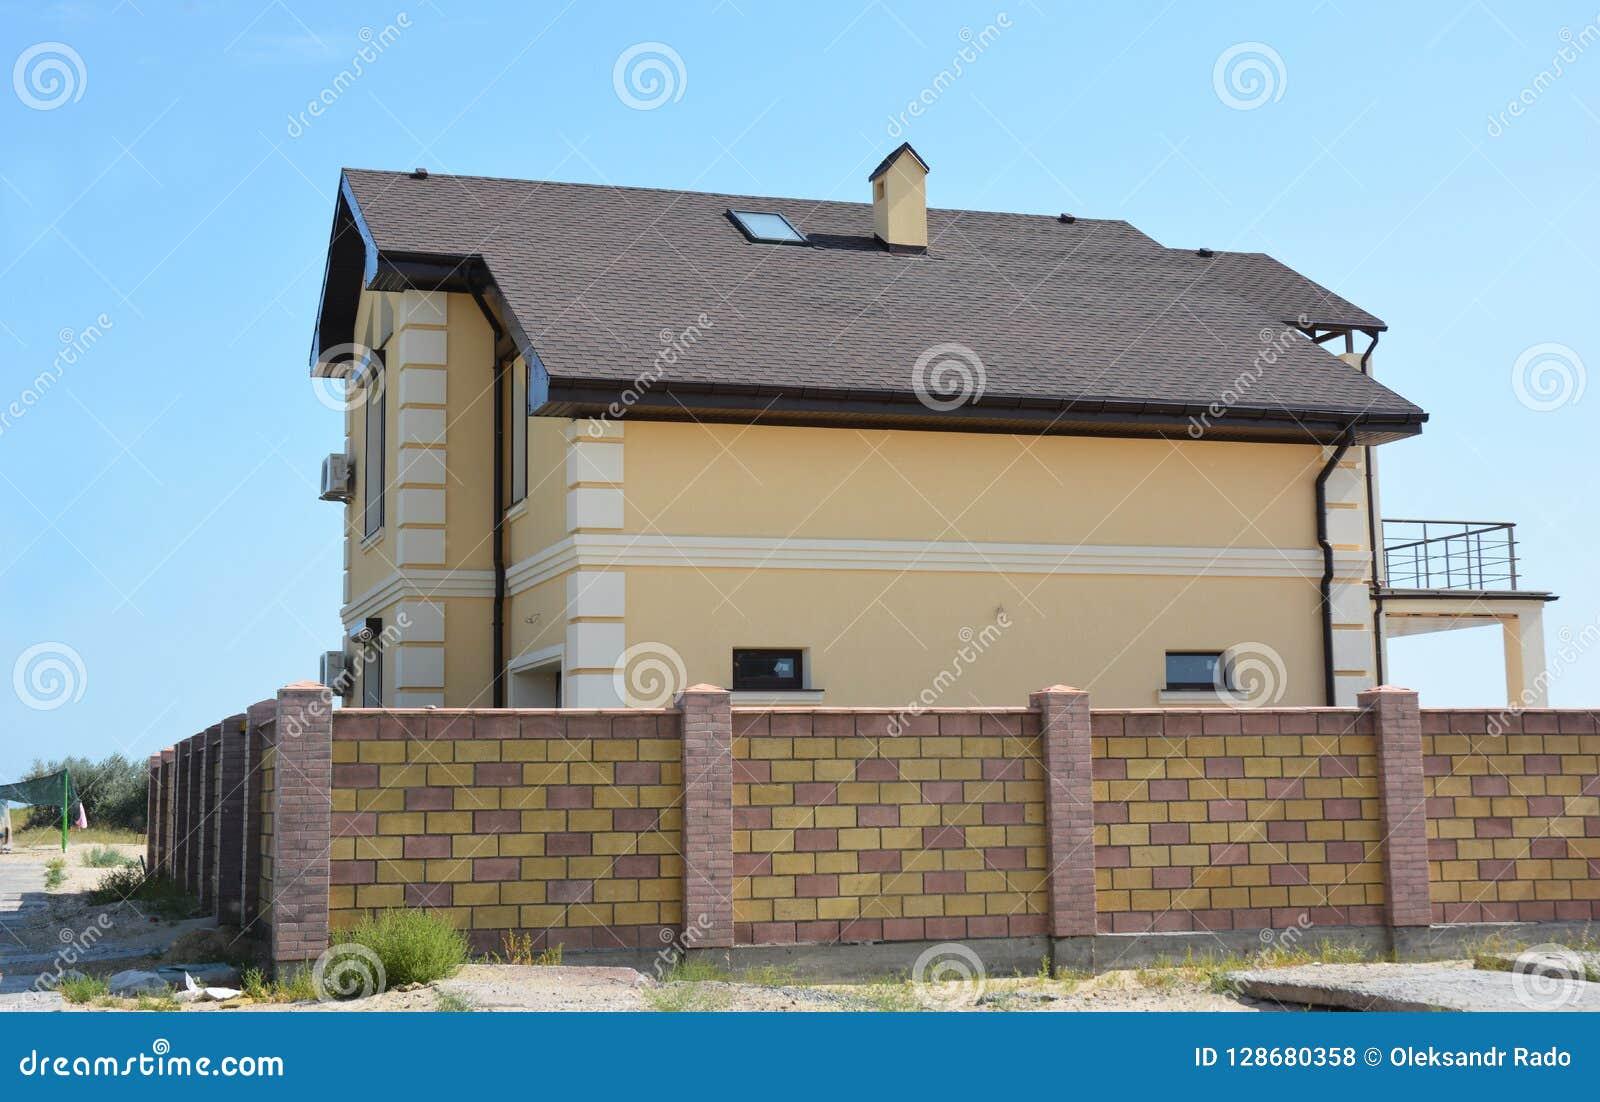 b25cb18cae16 Modern House With Balcony Terrace